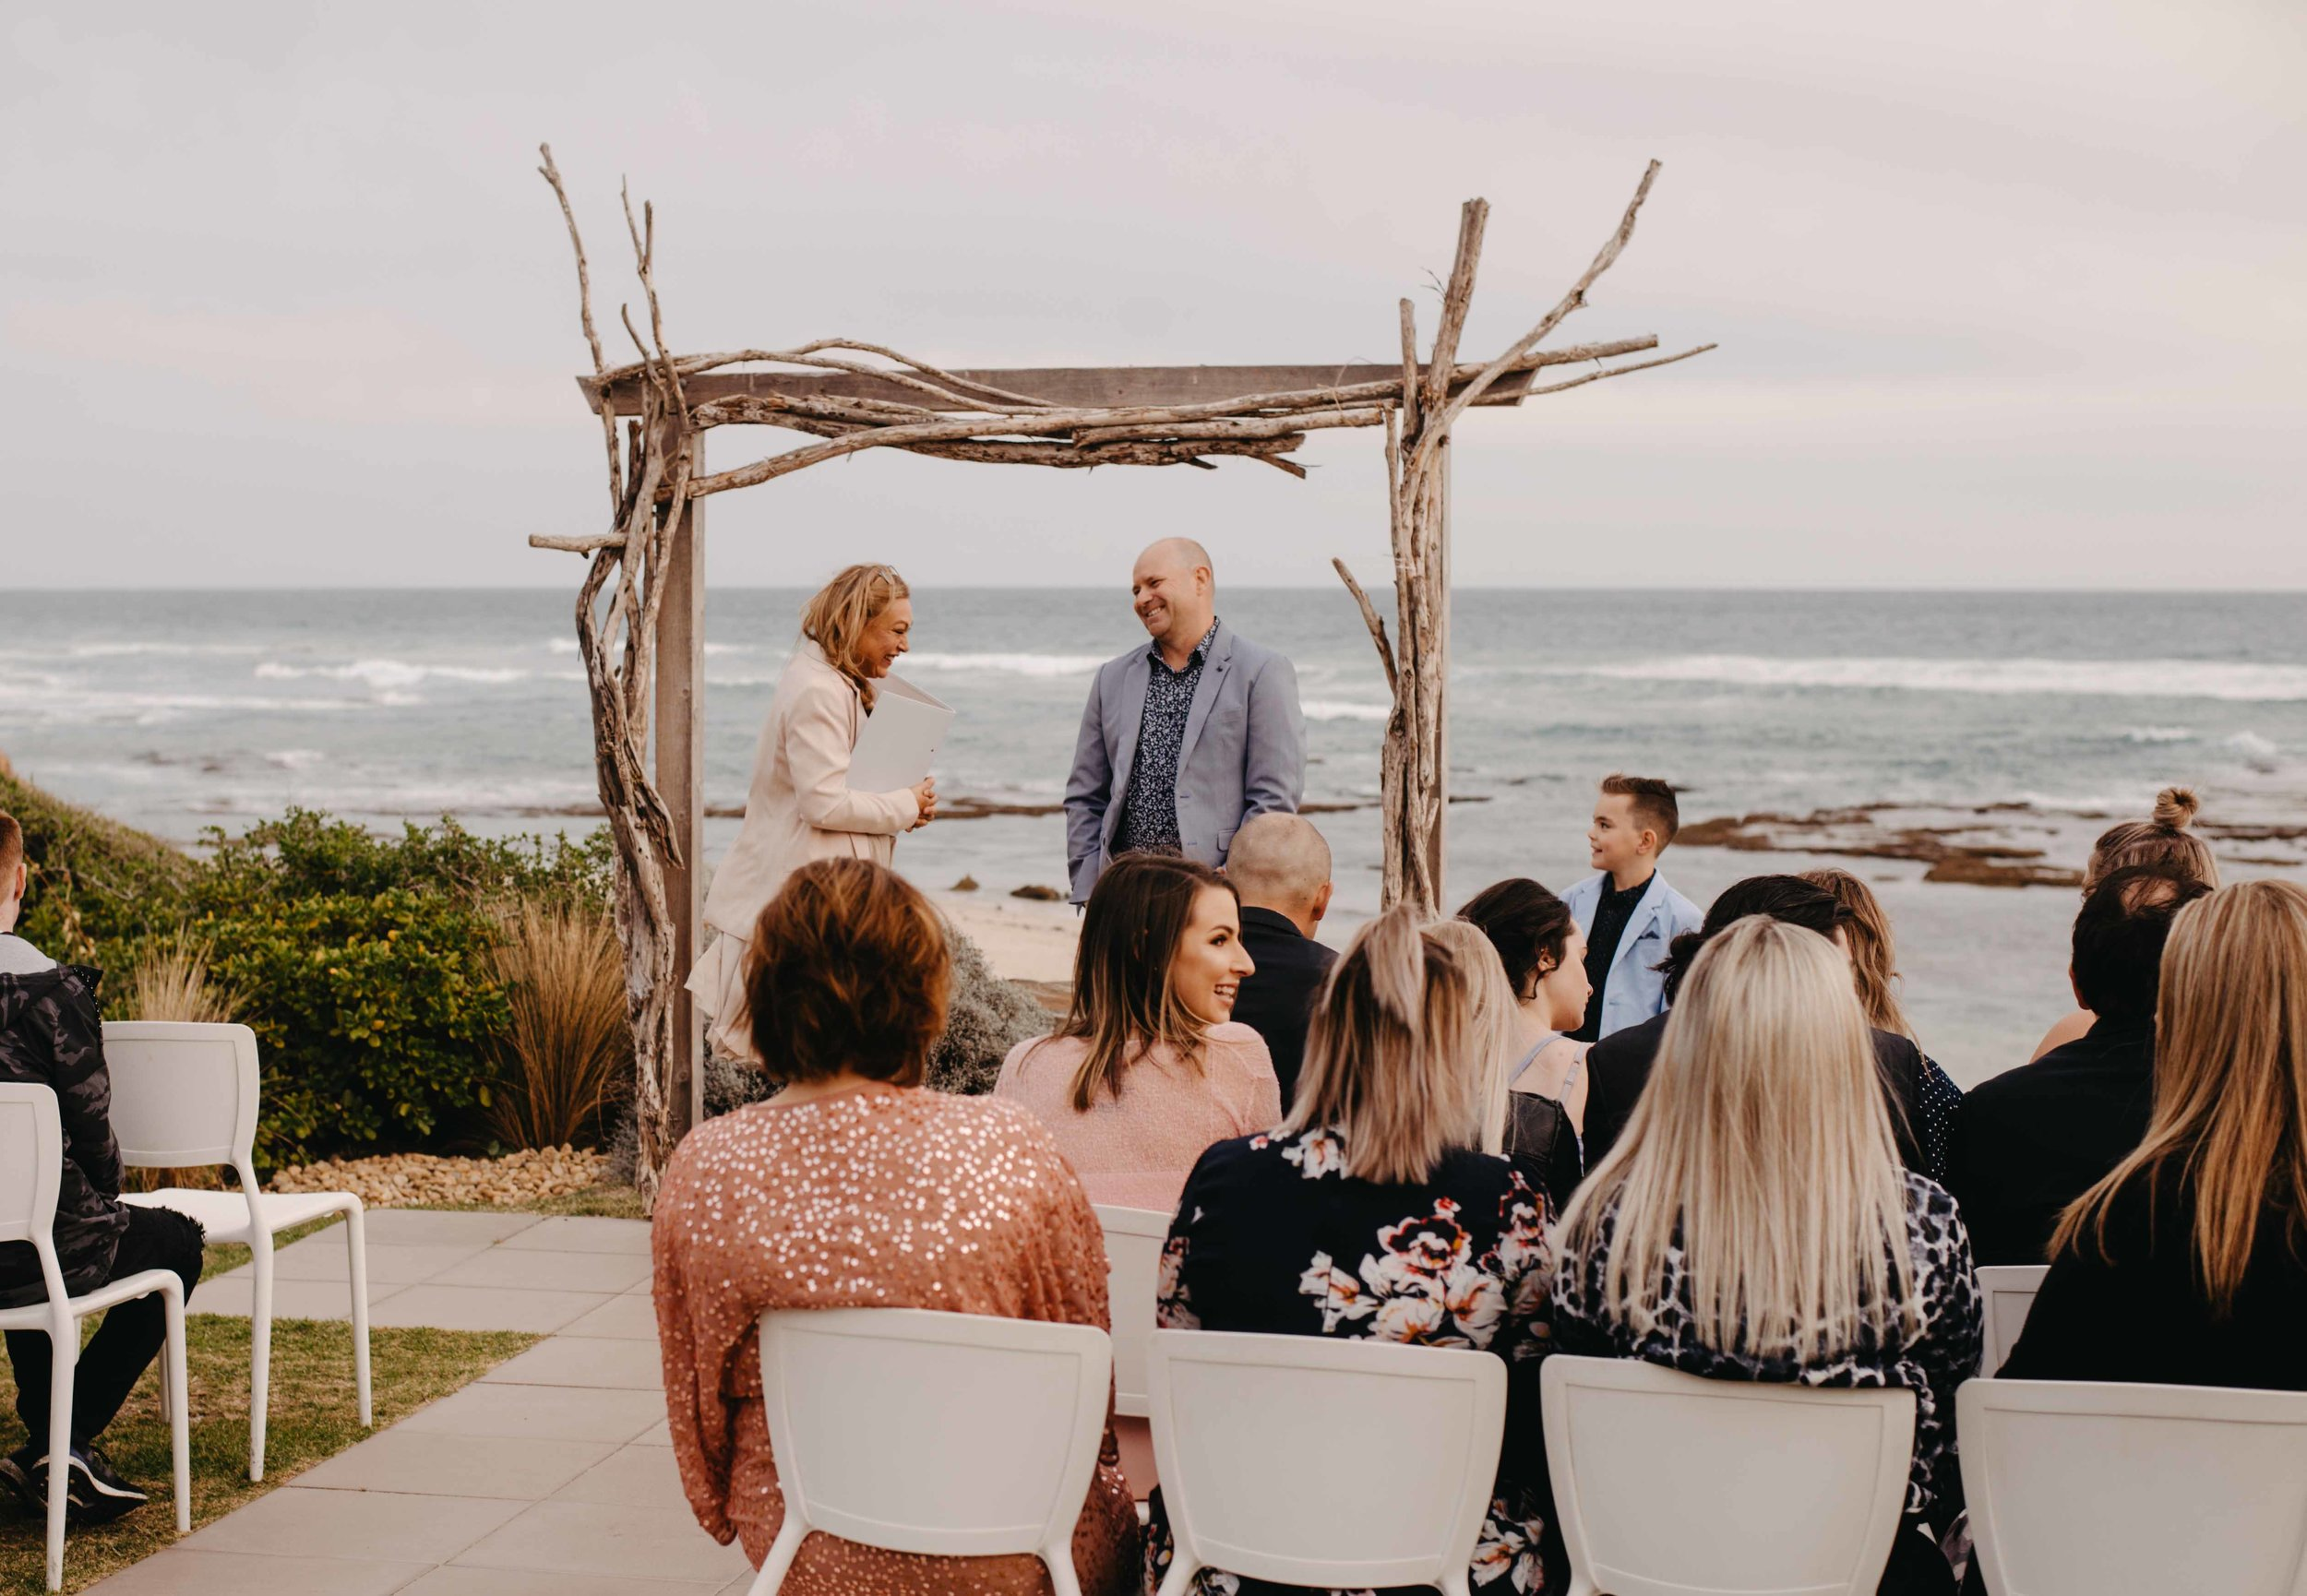 All-Smiles-Sorrento-Wedding-photography-sorrento-wedding-marissa-jade-photography-30.jpg